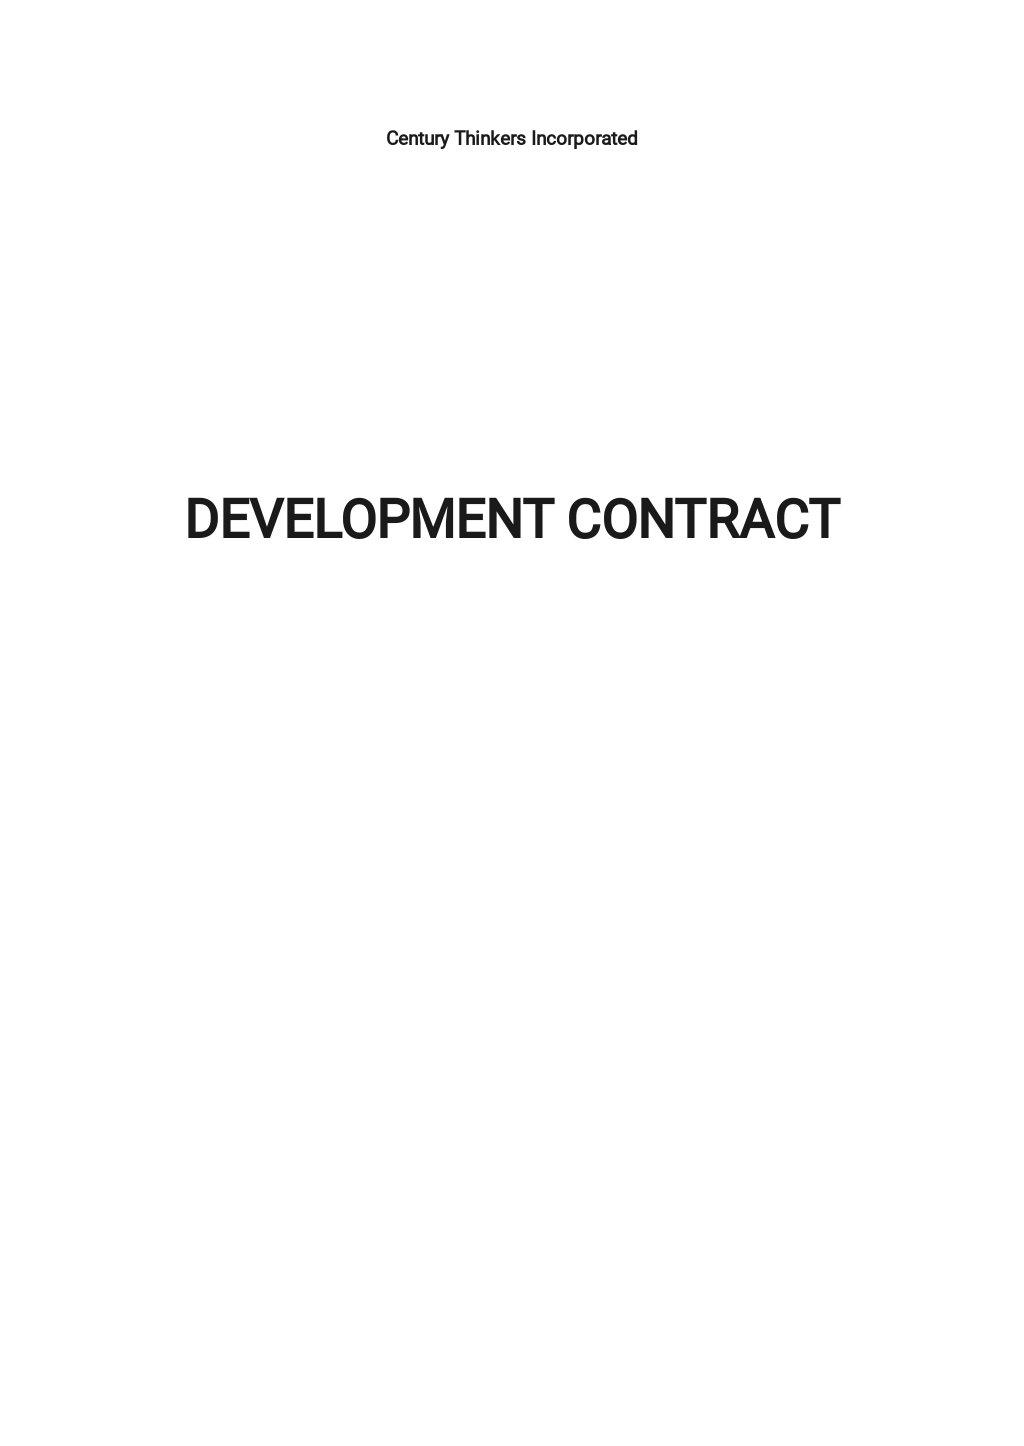 Development Contract Template.jpe